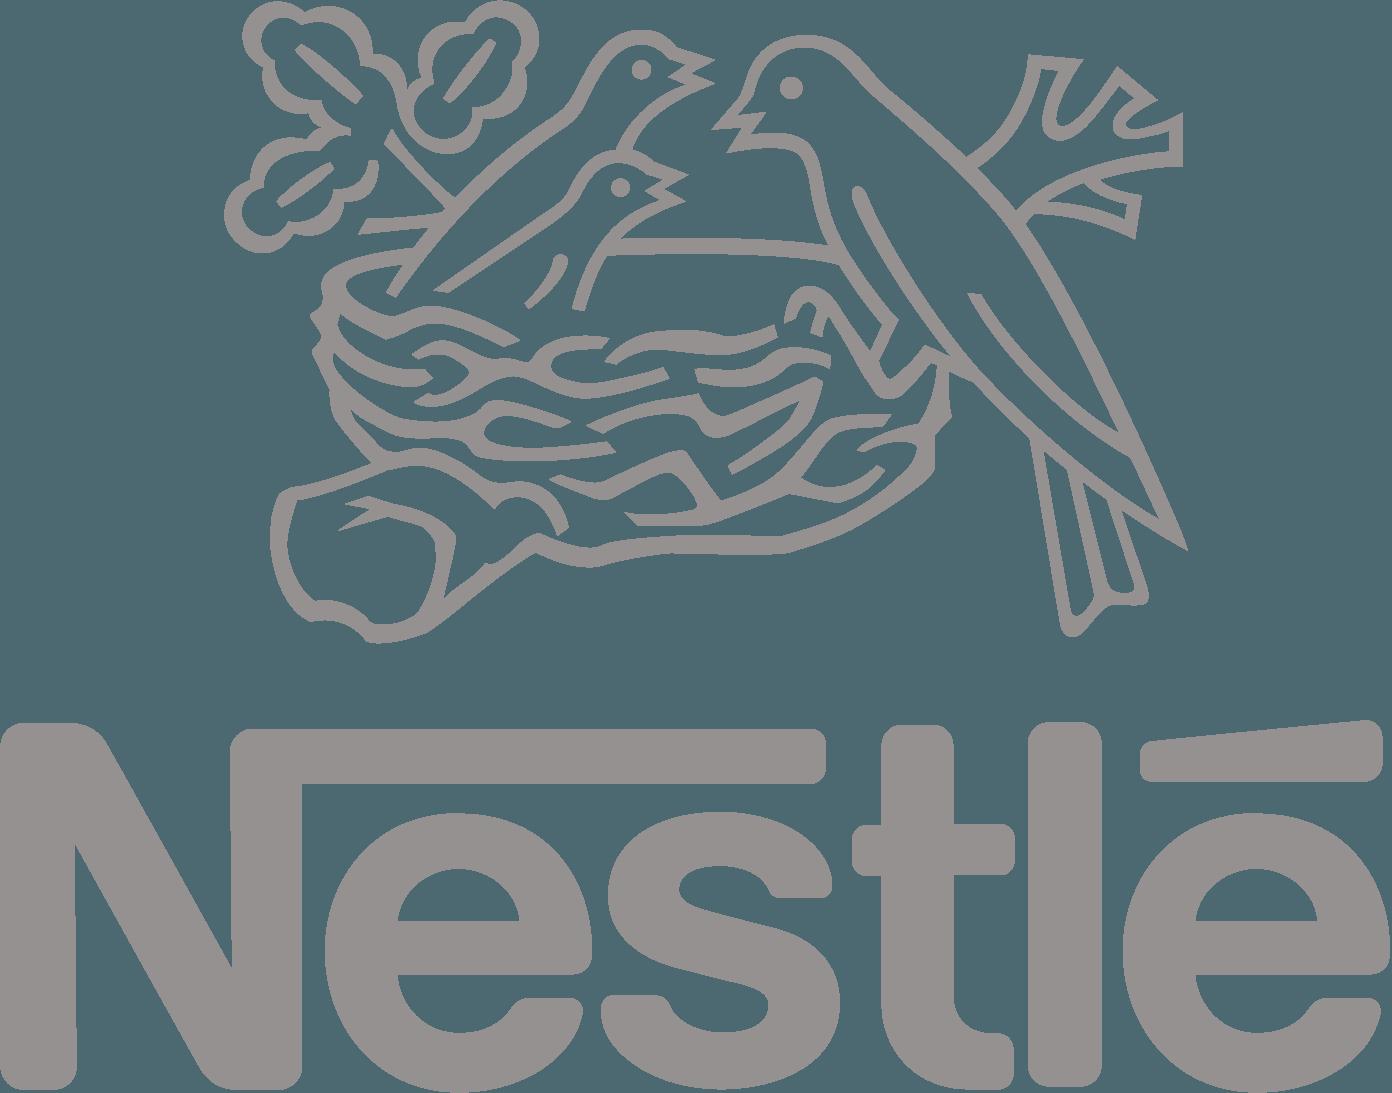 Nestl mission statement 2013   Strategic Management Insight 1392x1093